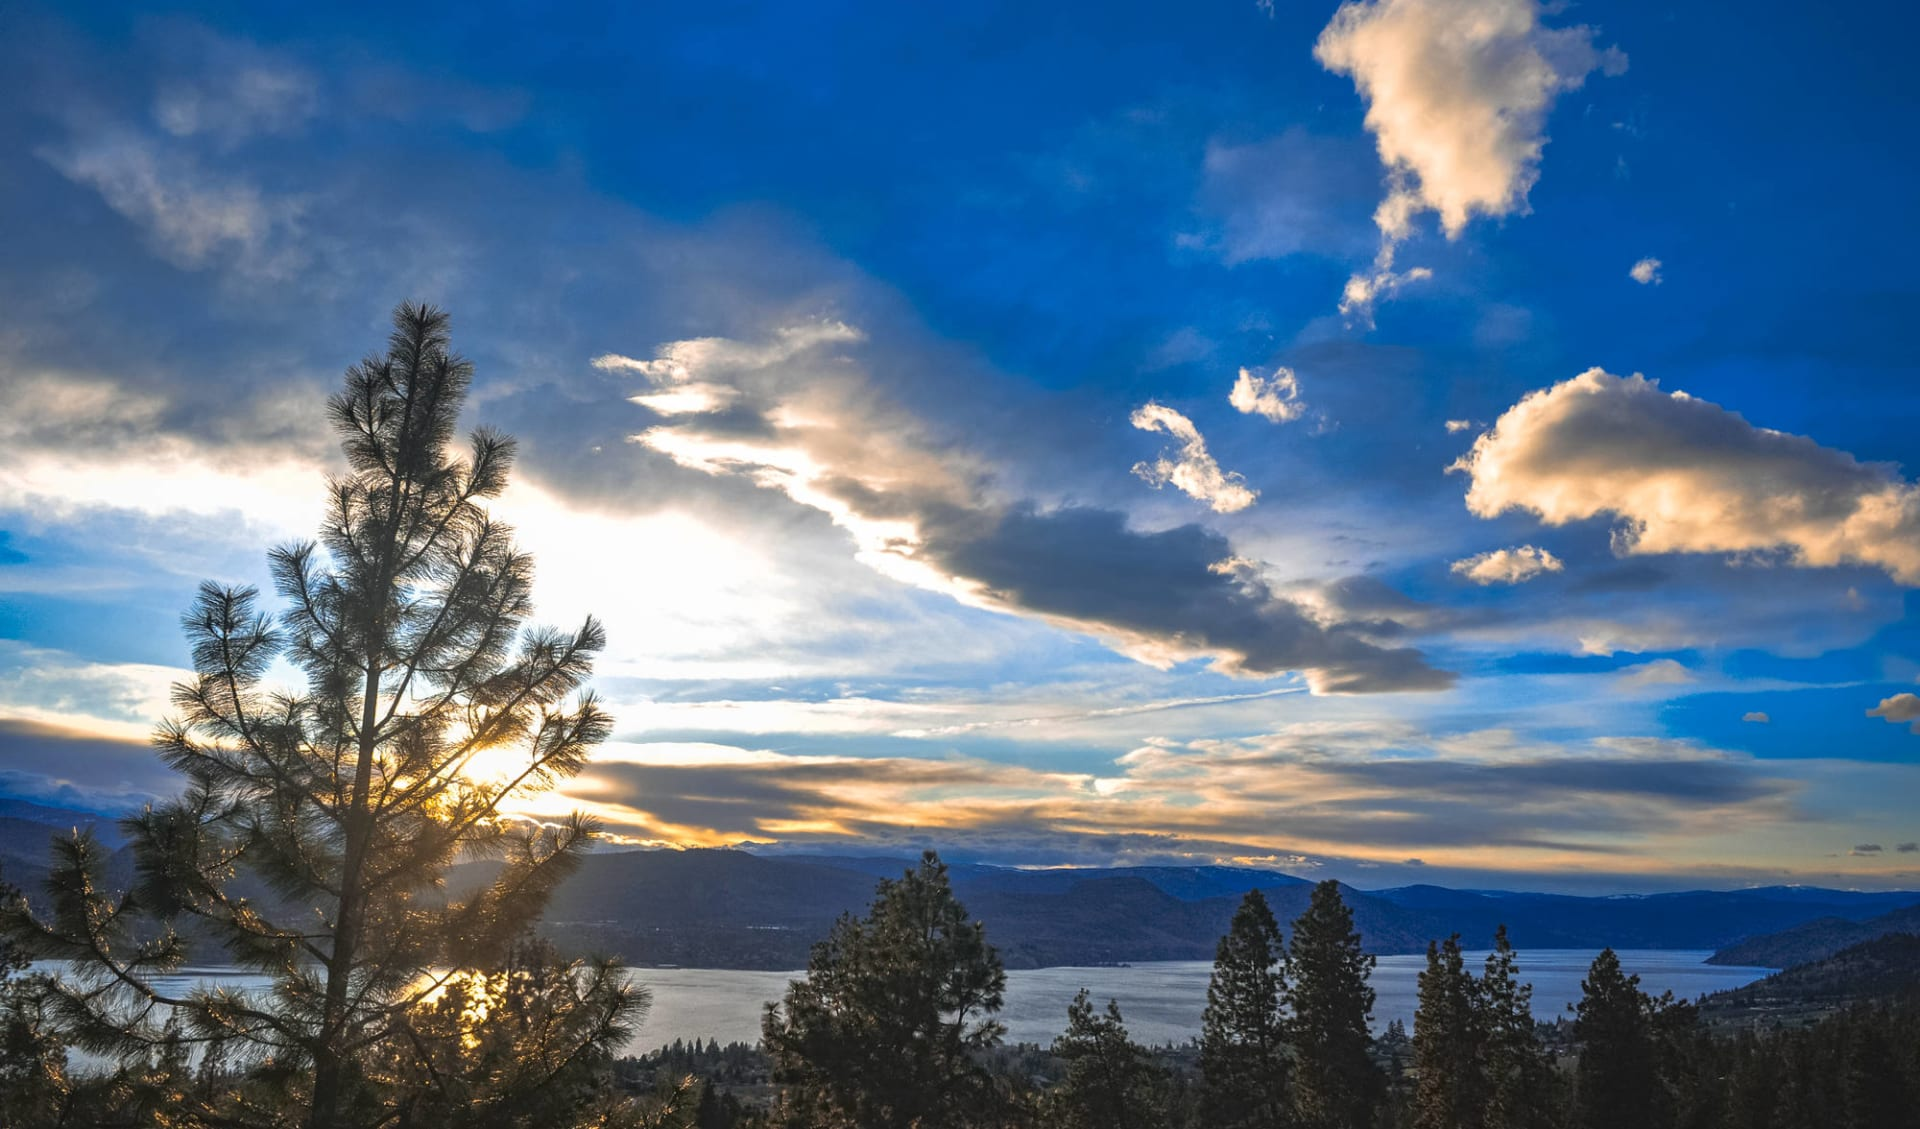 Le meilleur de Banff et Jasper: Kanada - Penticton B.C - Sonnenaufgang